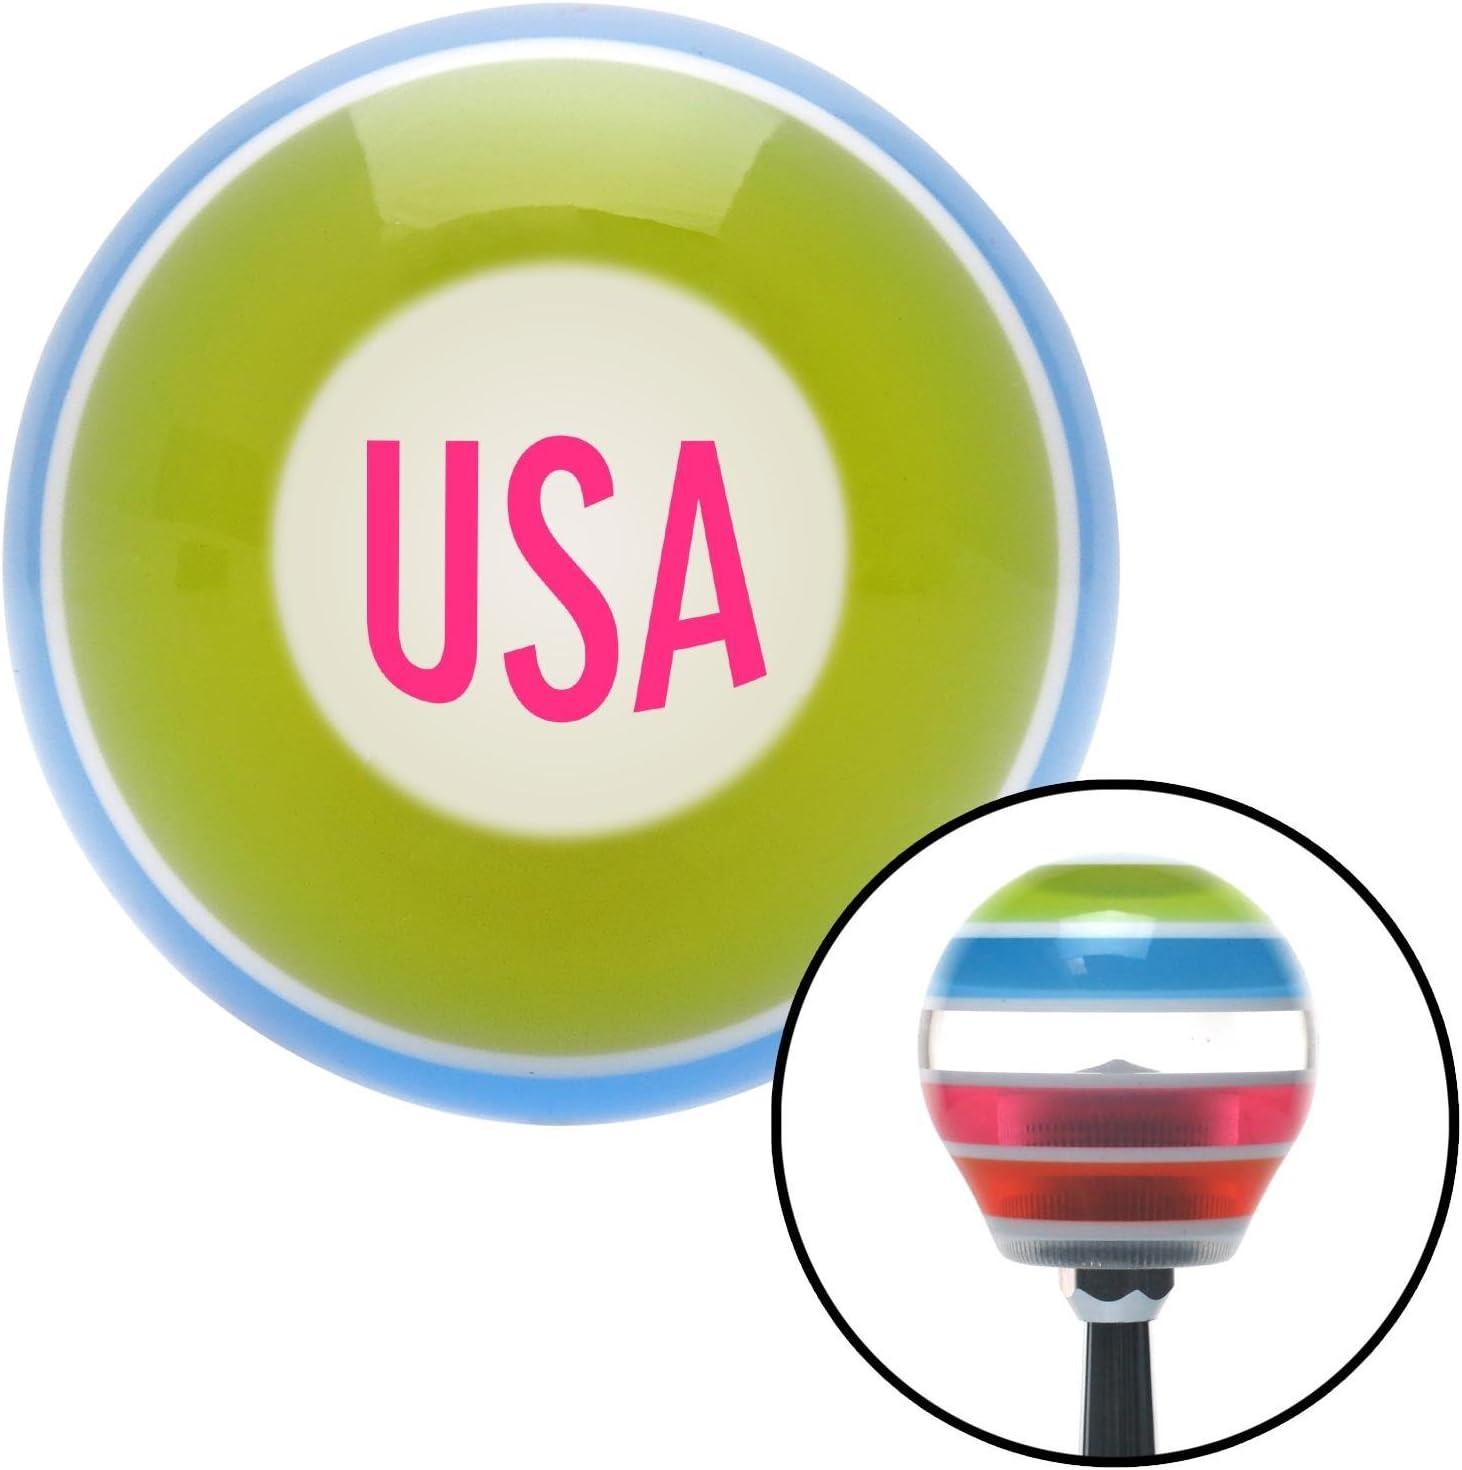 American Shifter 273525 Pink USA Stripe Shift Knob with M16 x 1.5 Insert